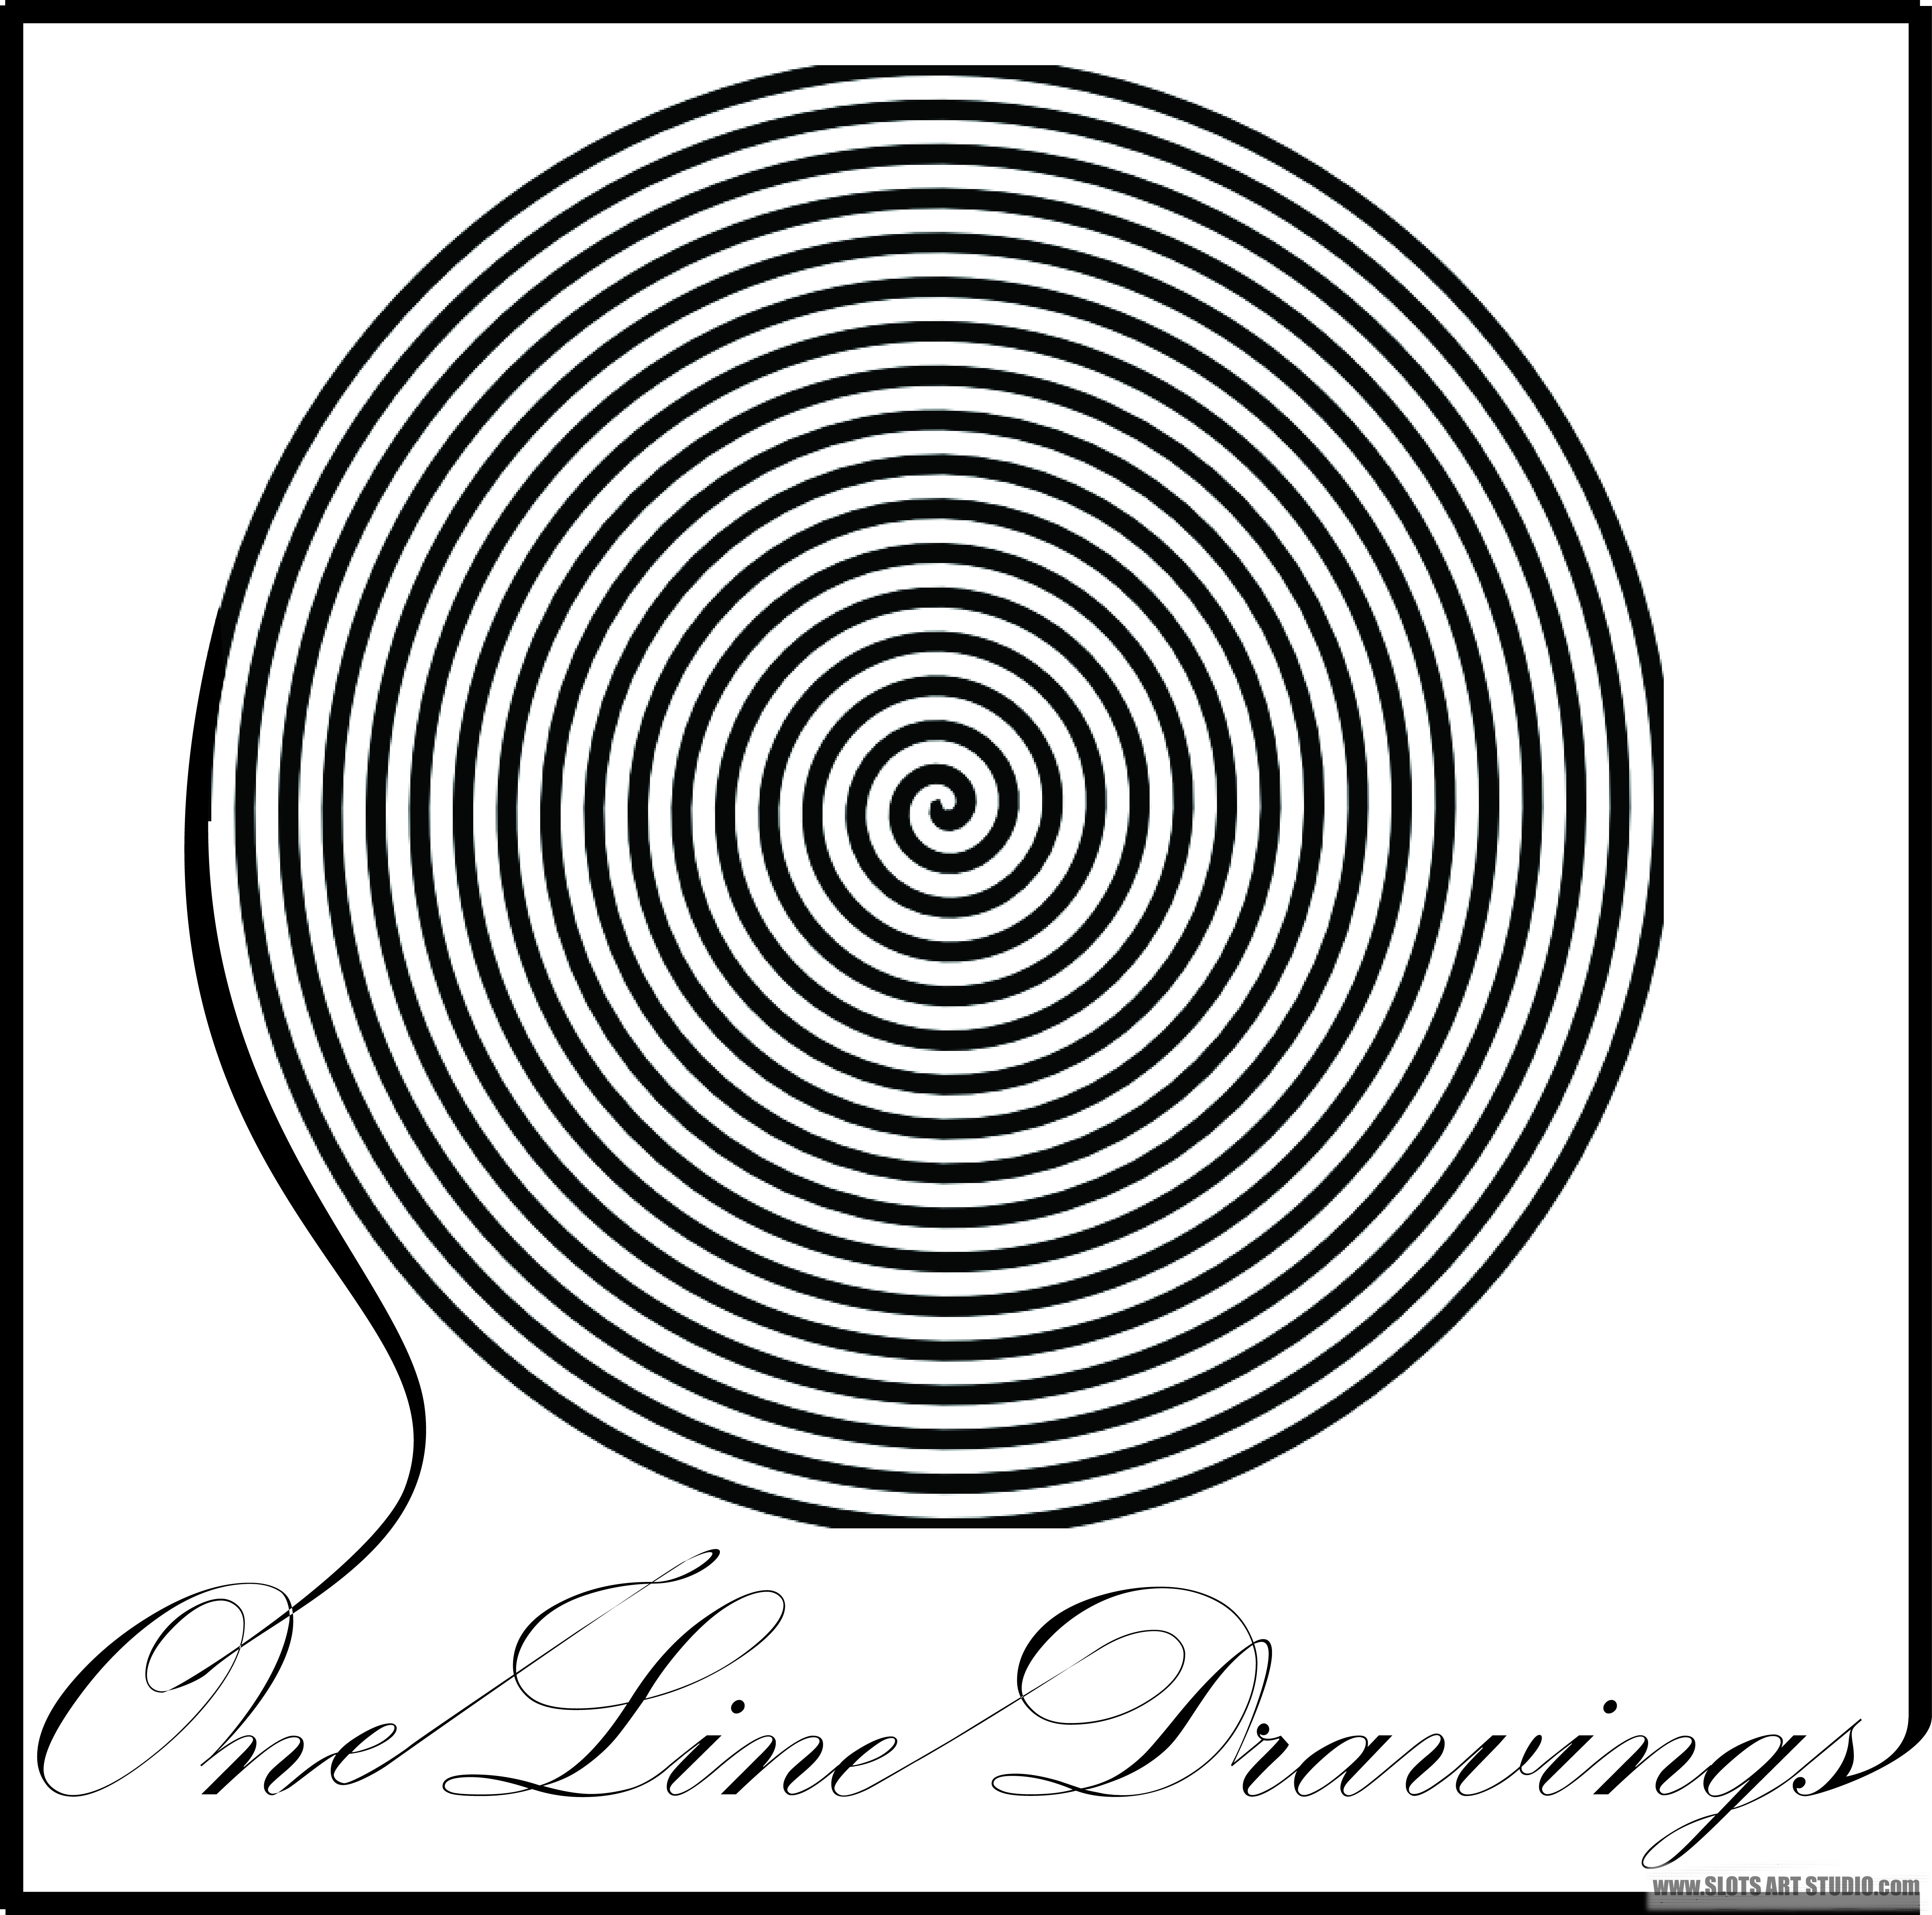 5193x5146 One Line Drawings By Artist, Michael Slotwinski, Slots Art Studio